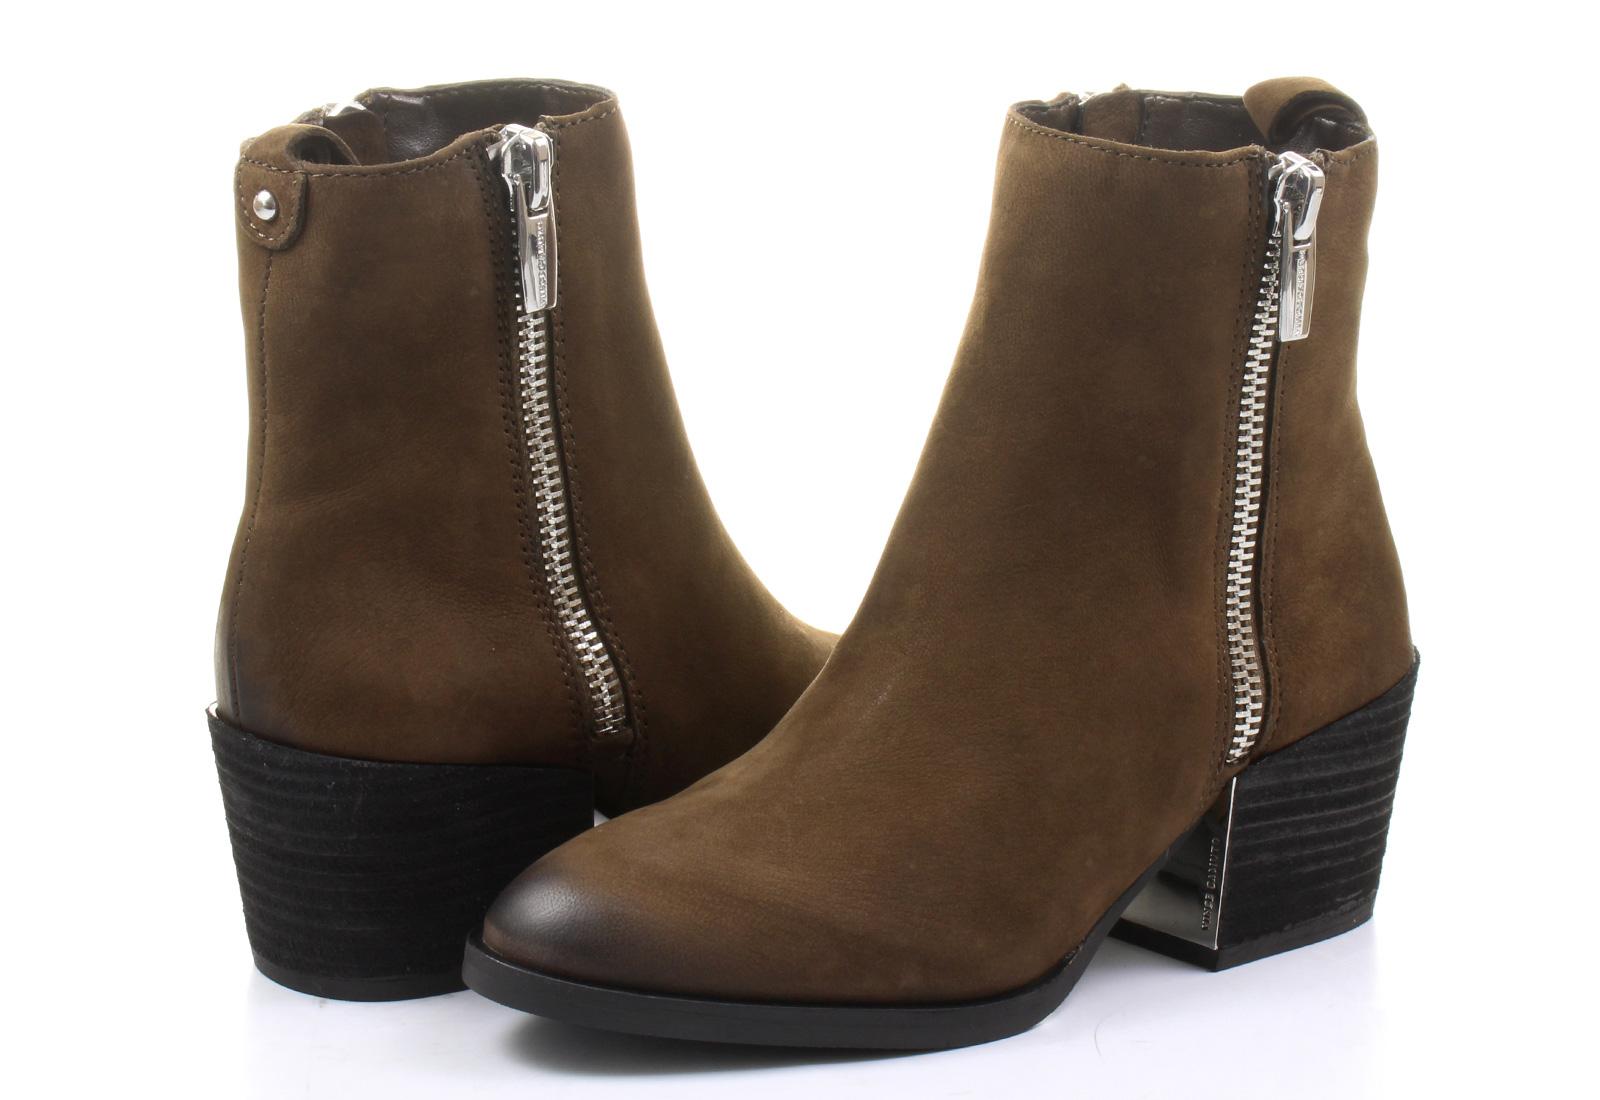 Vince Camuto Boots - Imala - imala-tau - Online shop for